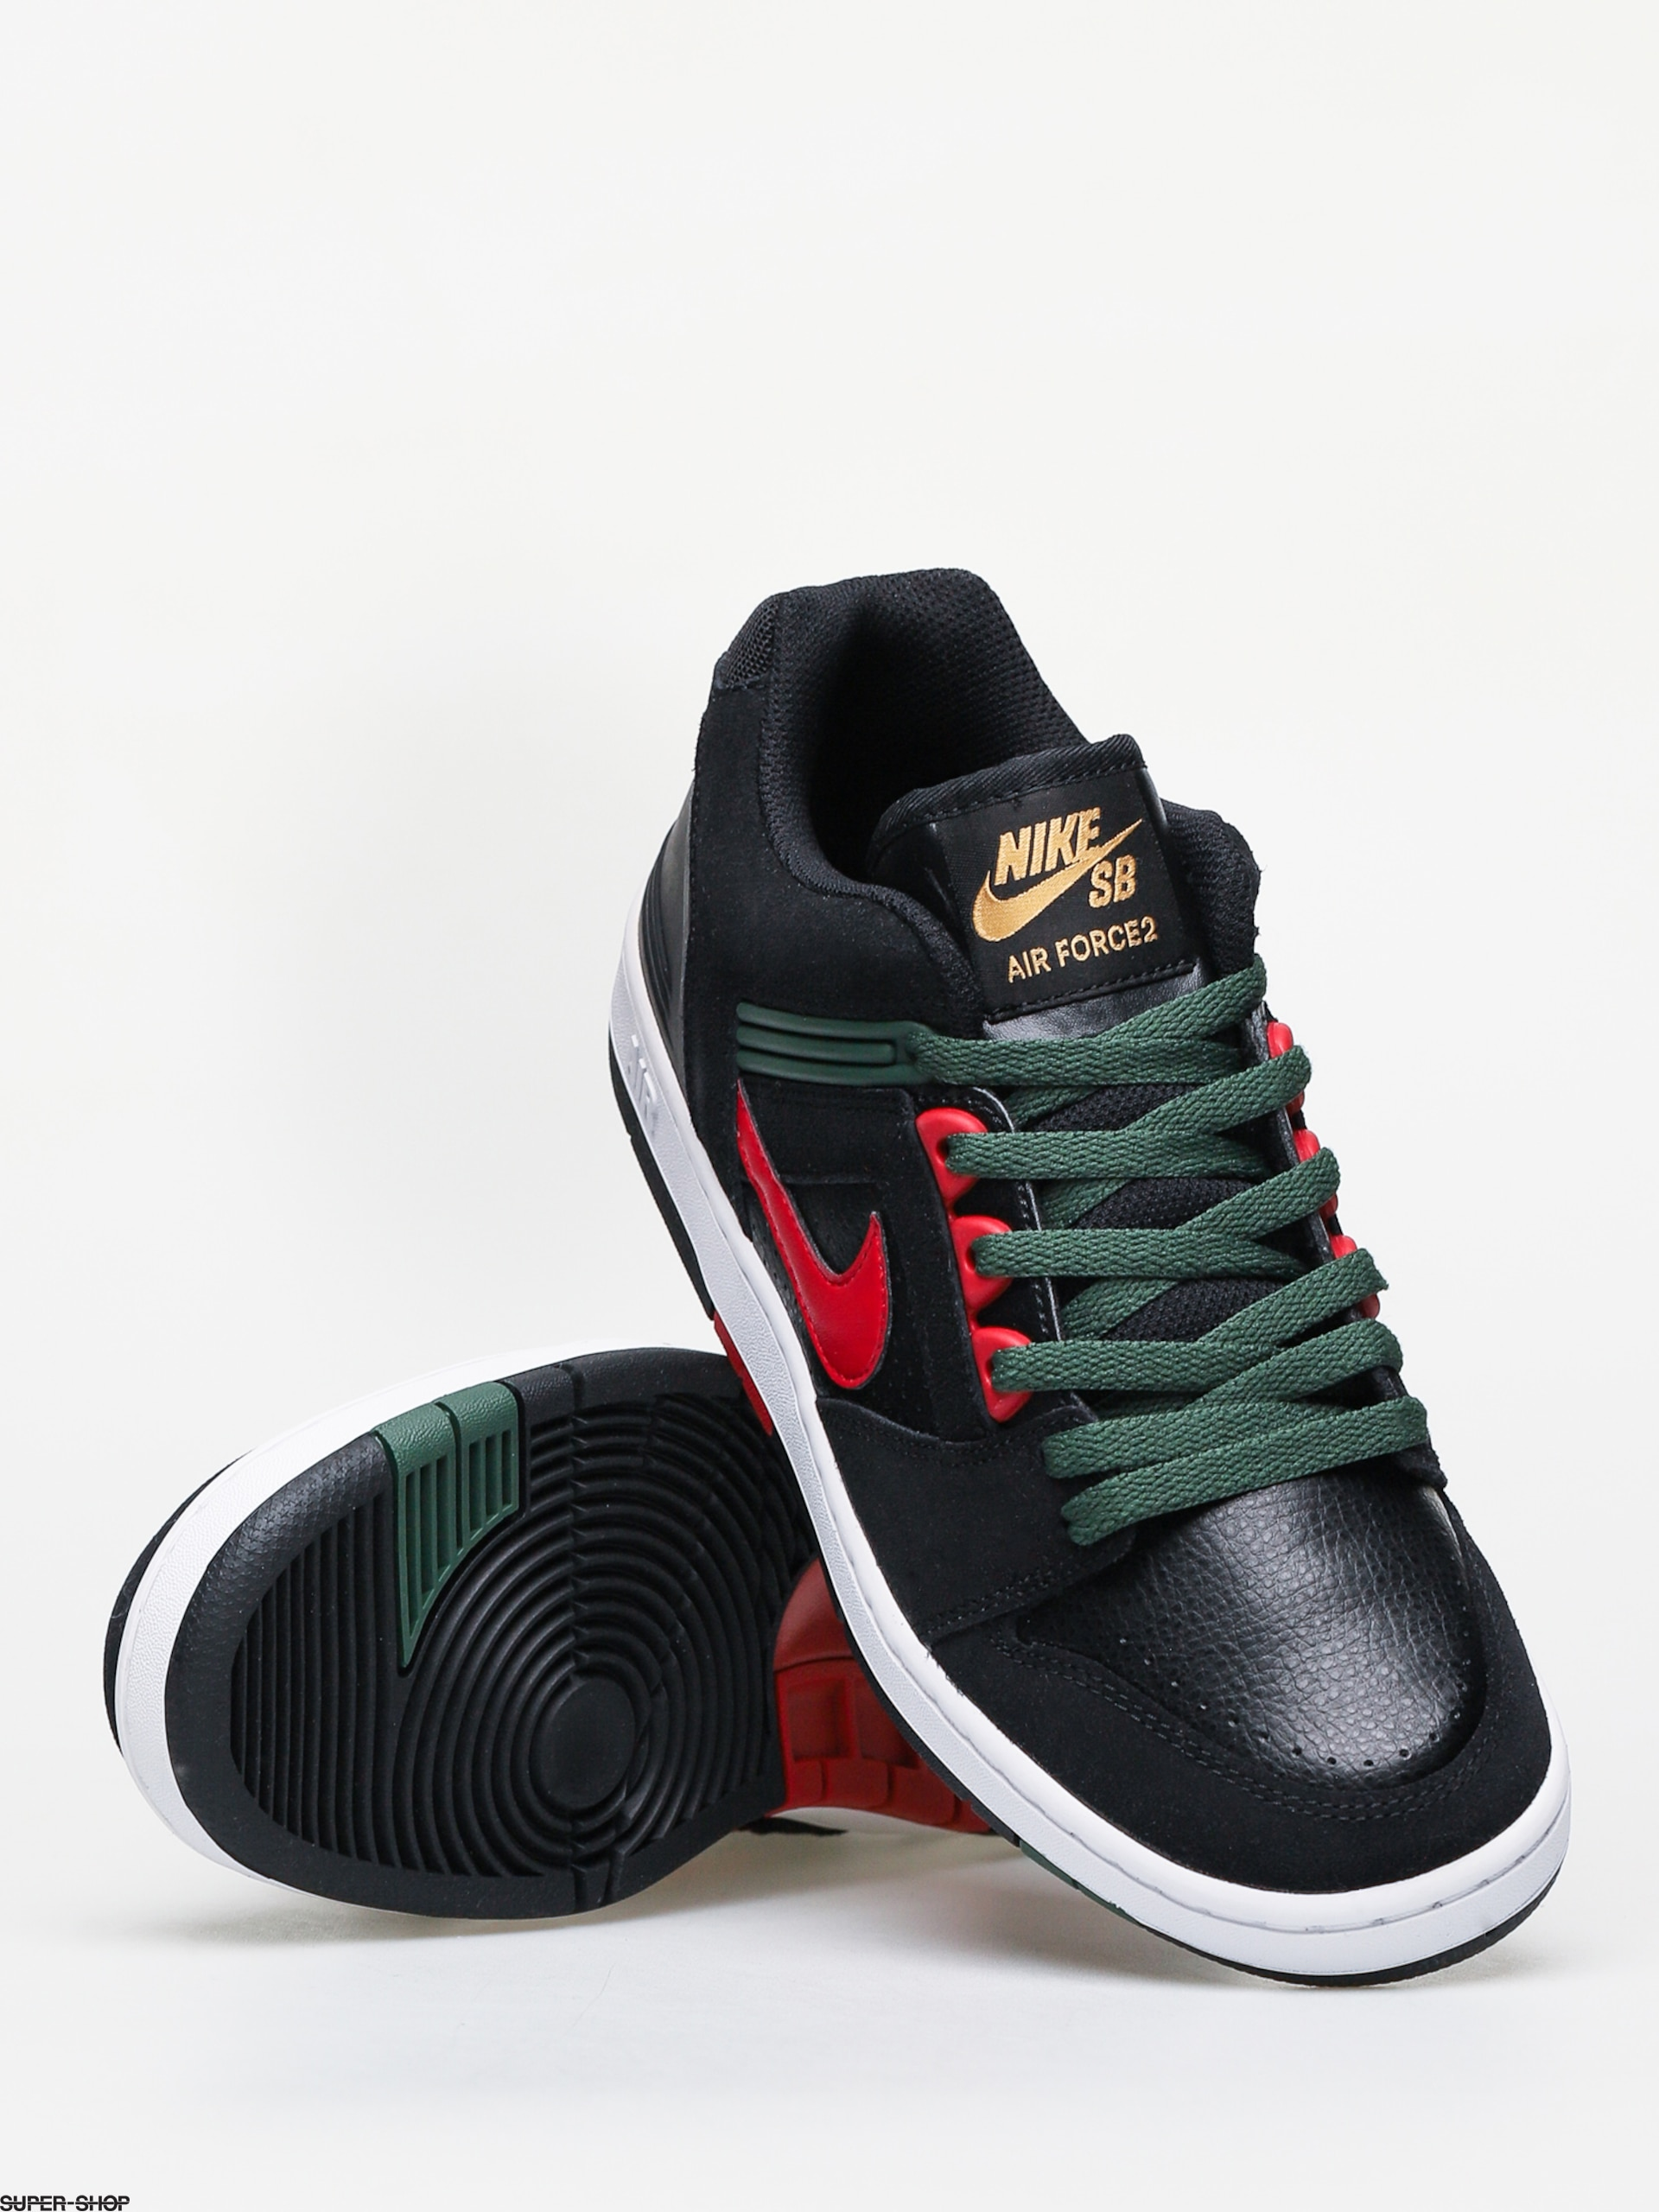 Nike SB Air Force II Low Shoes (black